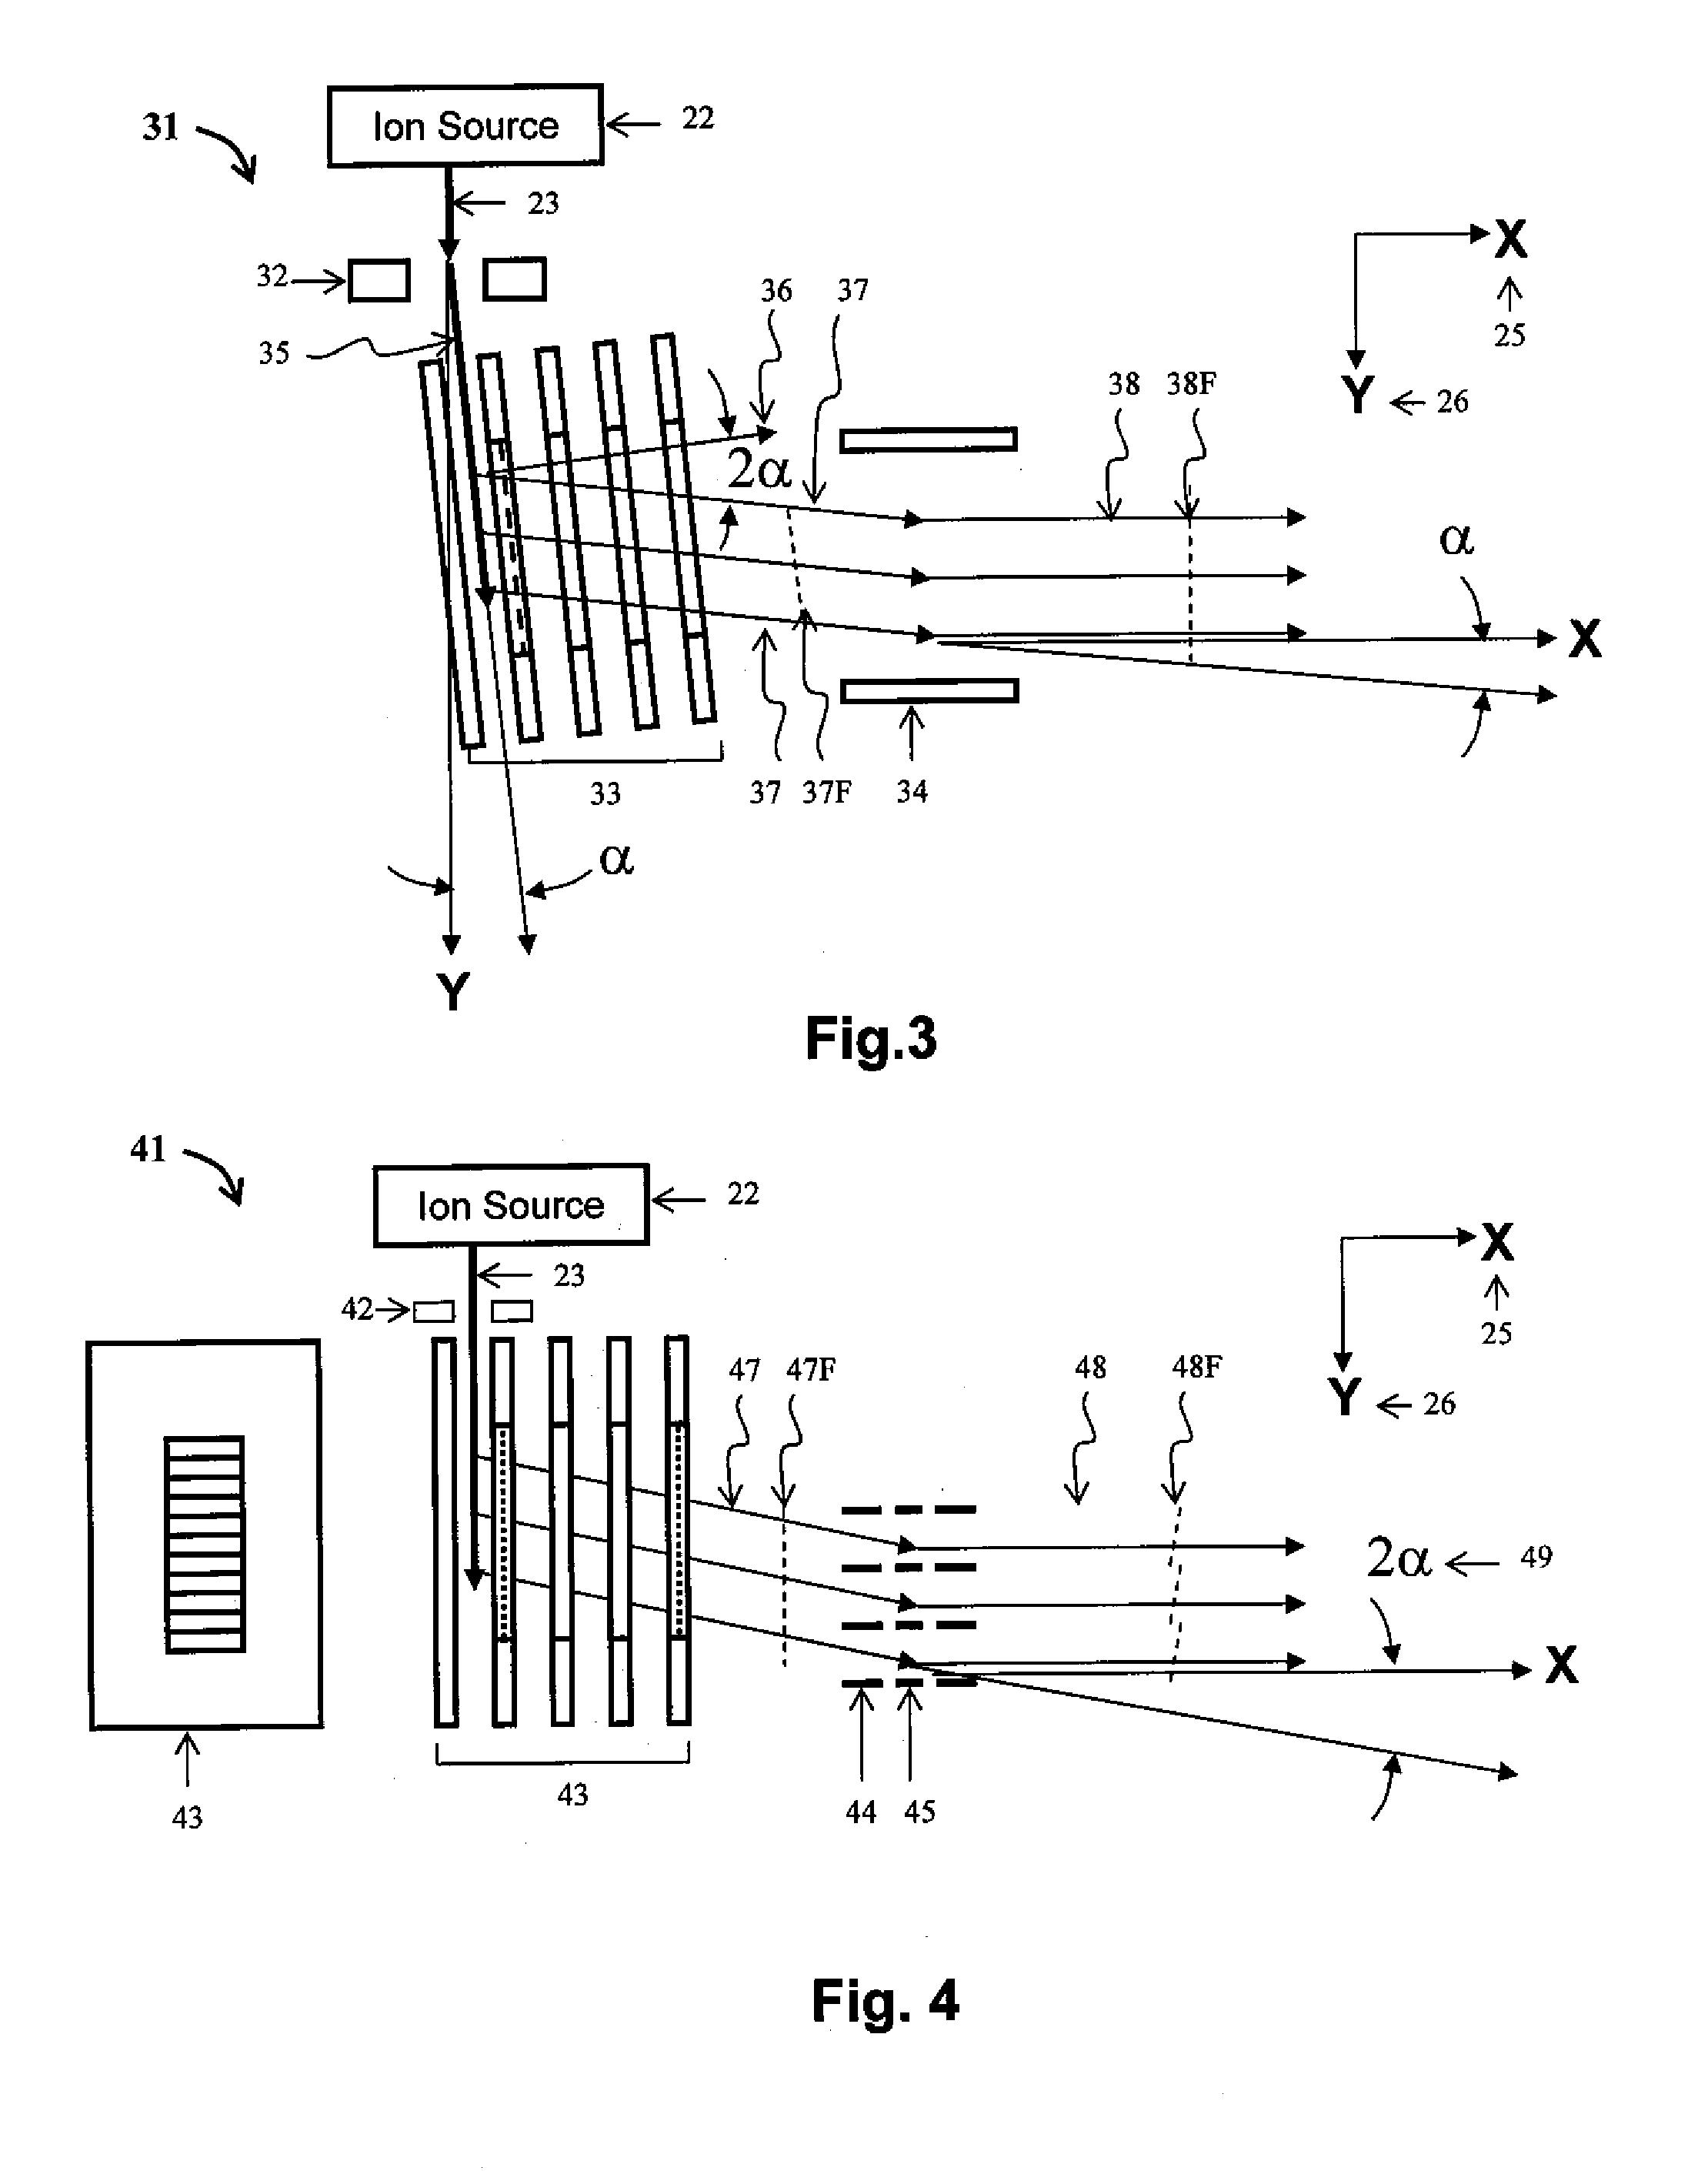 passtime pte 3 wiring diagram Collection-Passtime Gps Wiring Diagram 17-i